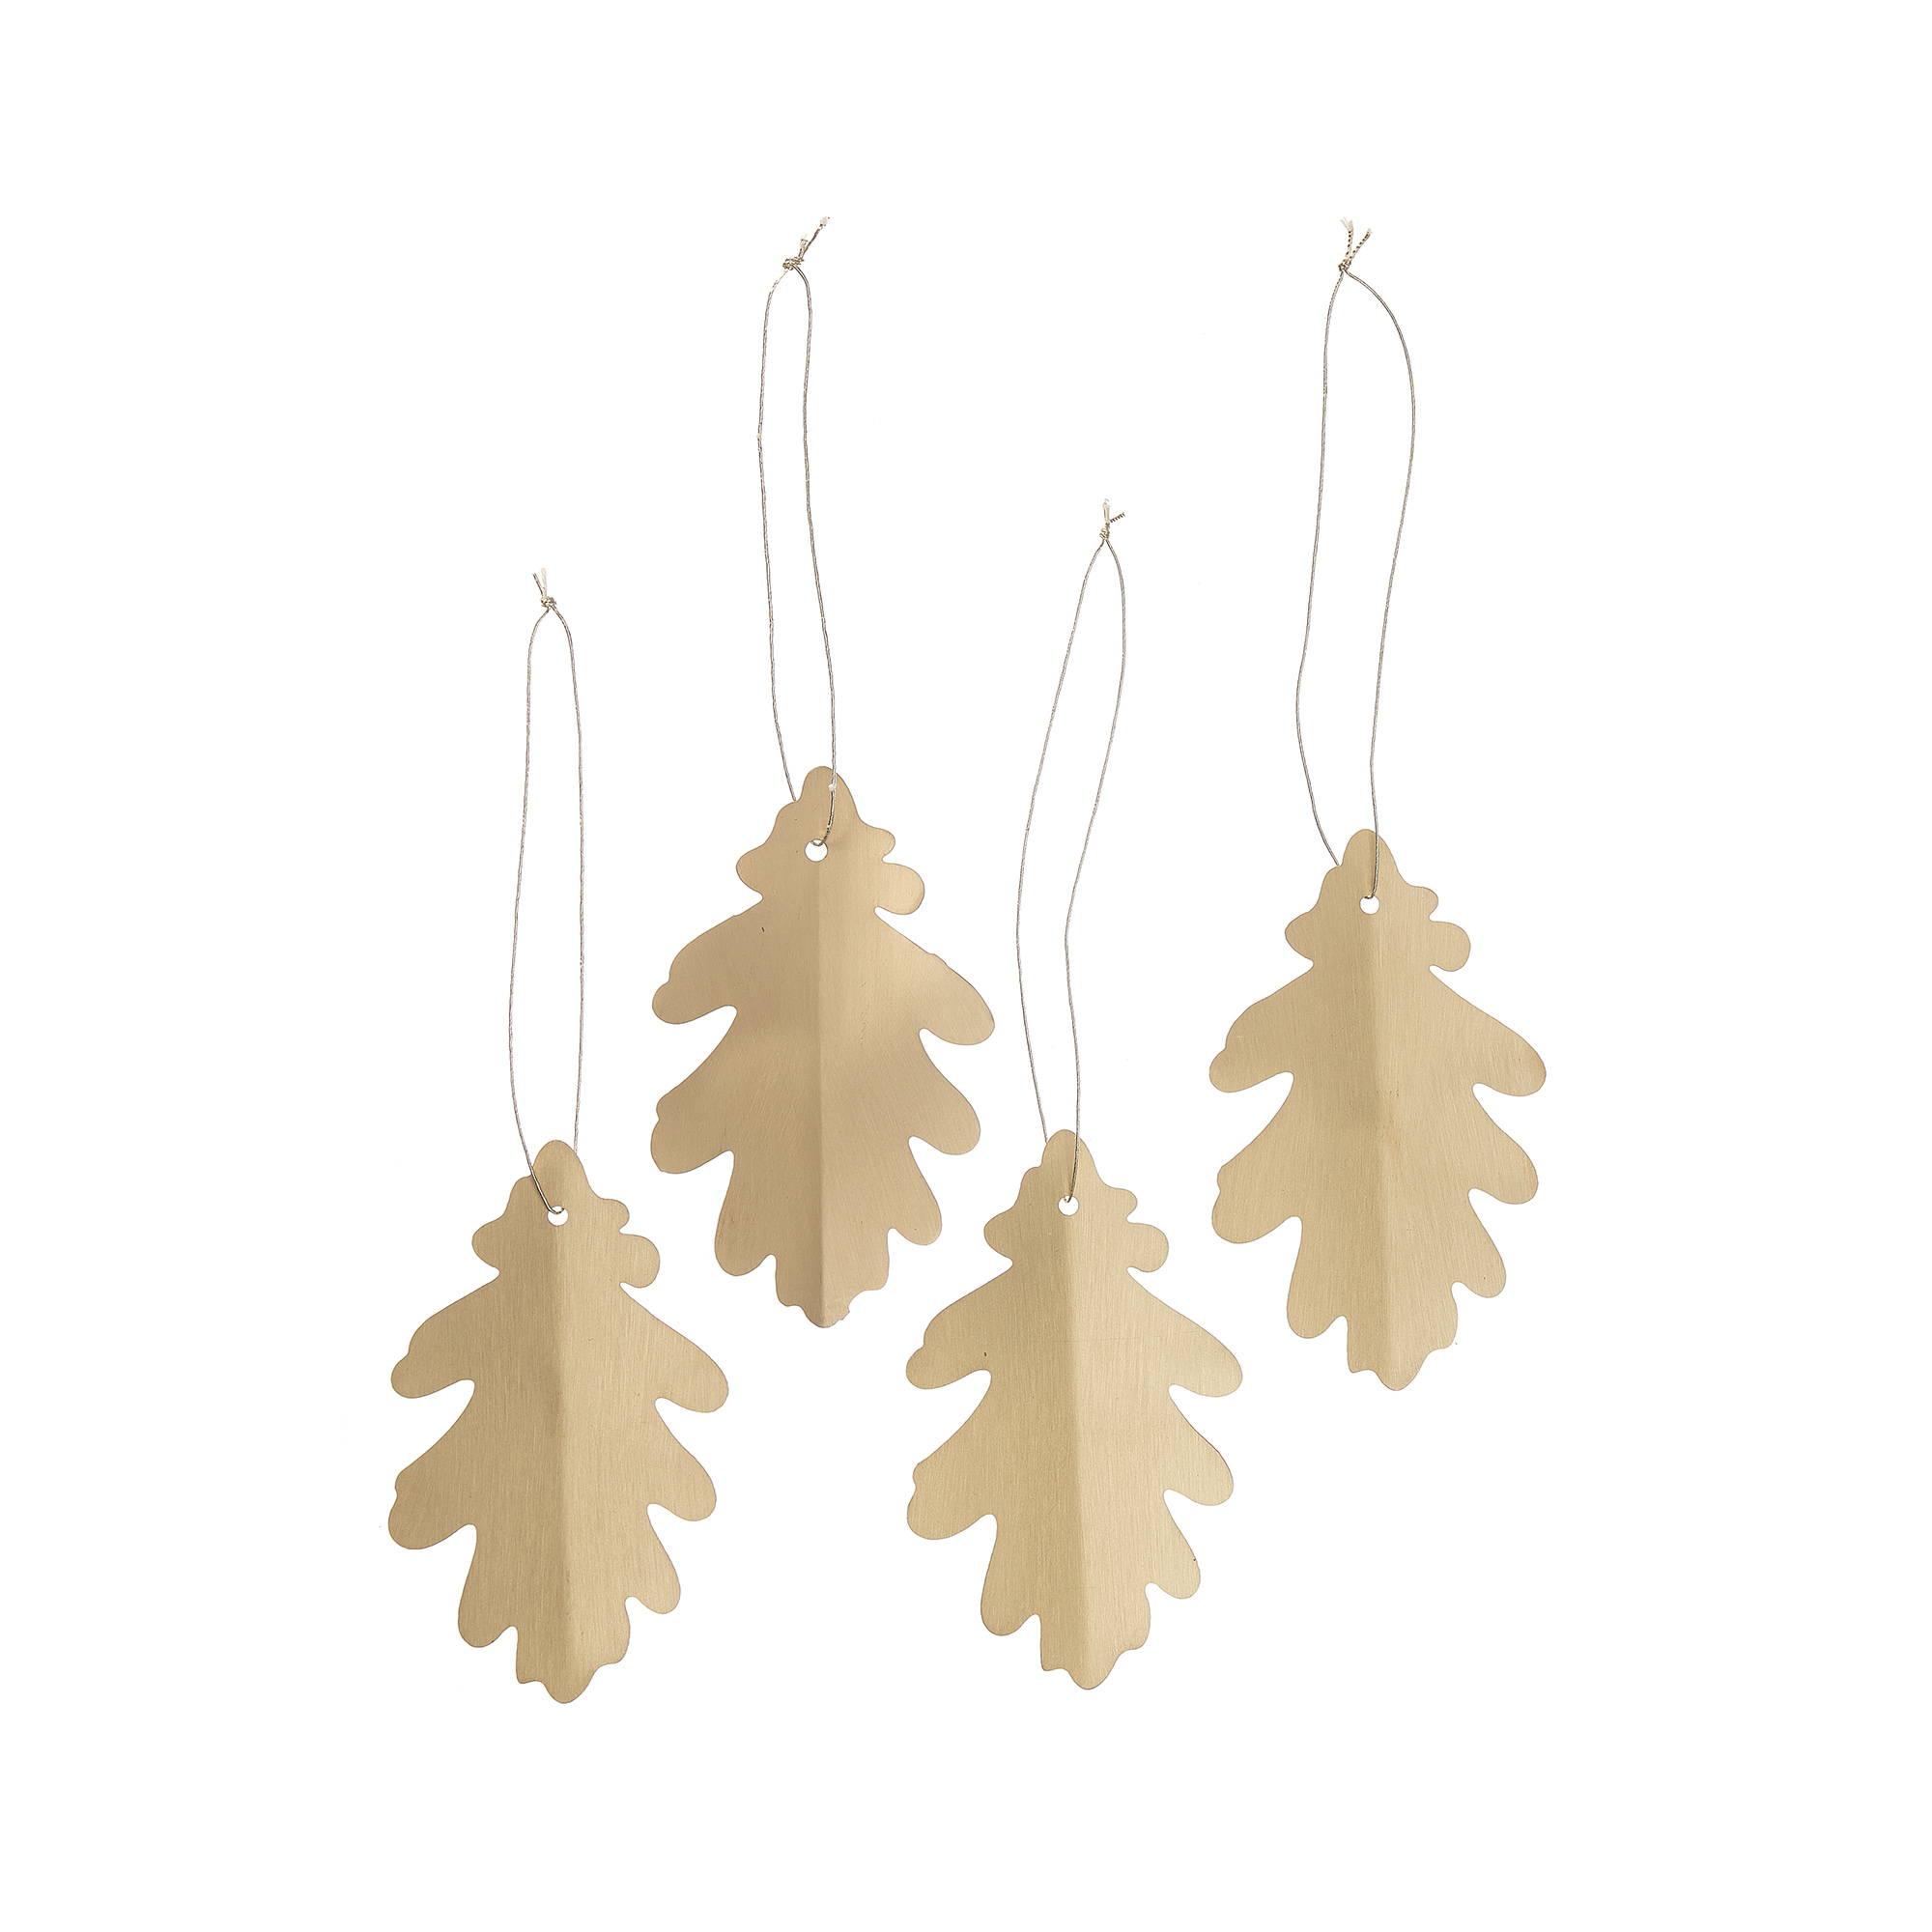 Nangal Christmas Tree Decorations